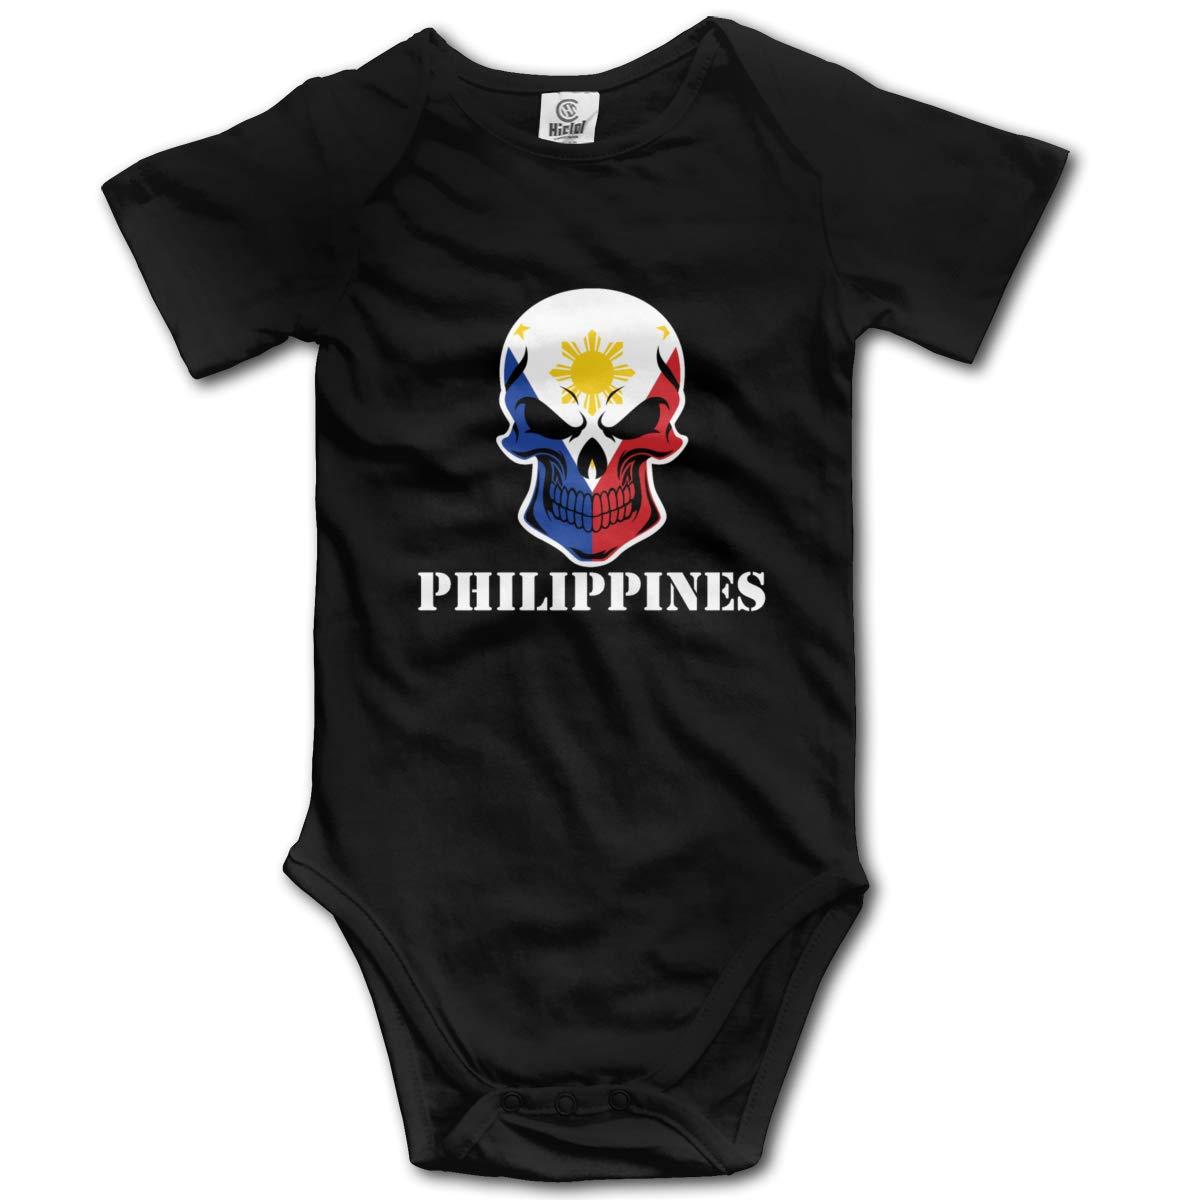 FOECBIR Philippines Skull Baby Boys Girls Jumpsuit Short-Sleeve Romper Bodysuit